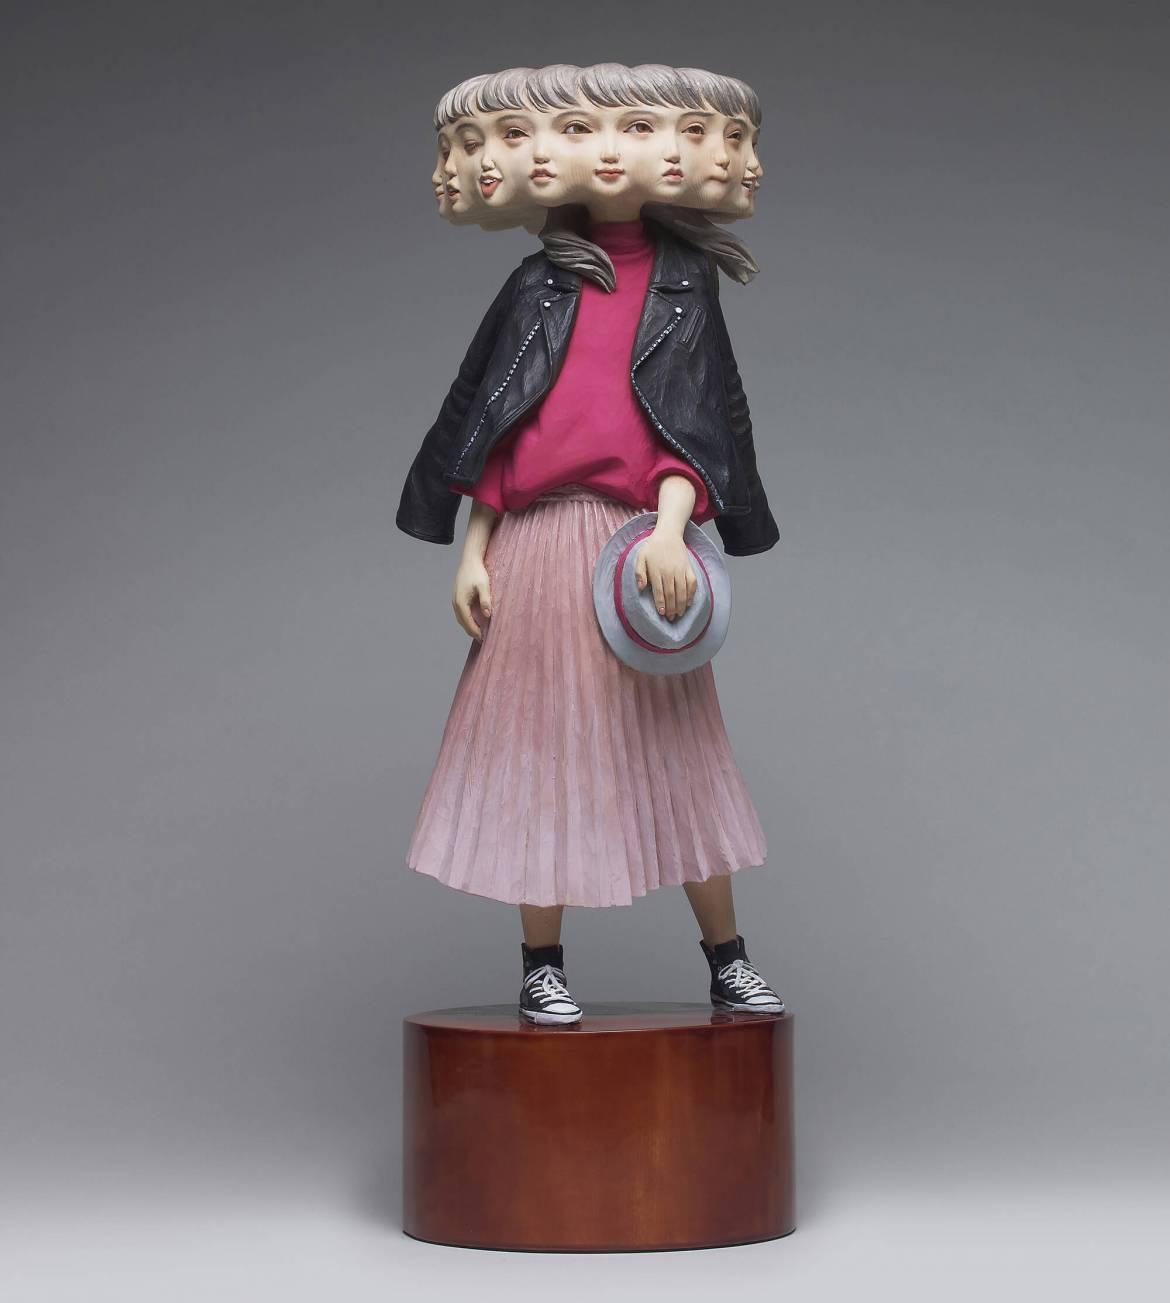 Wooden Sculpture by Yoshitoshi Kanemaki two